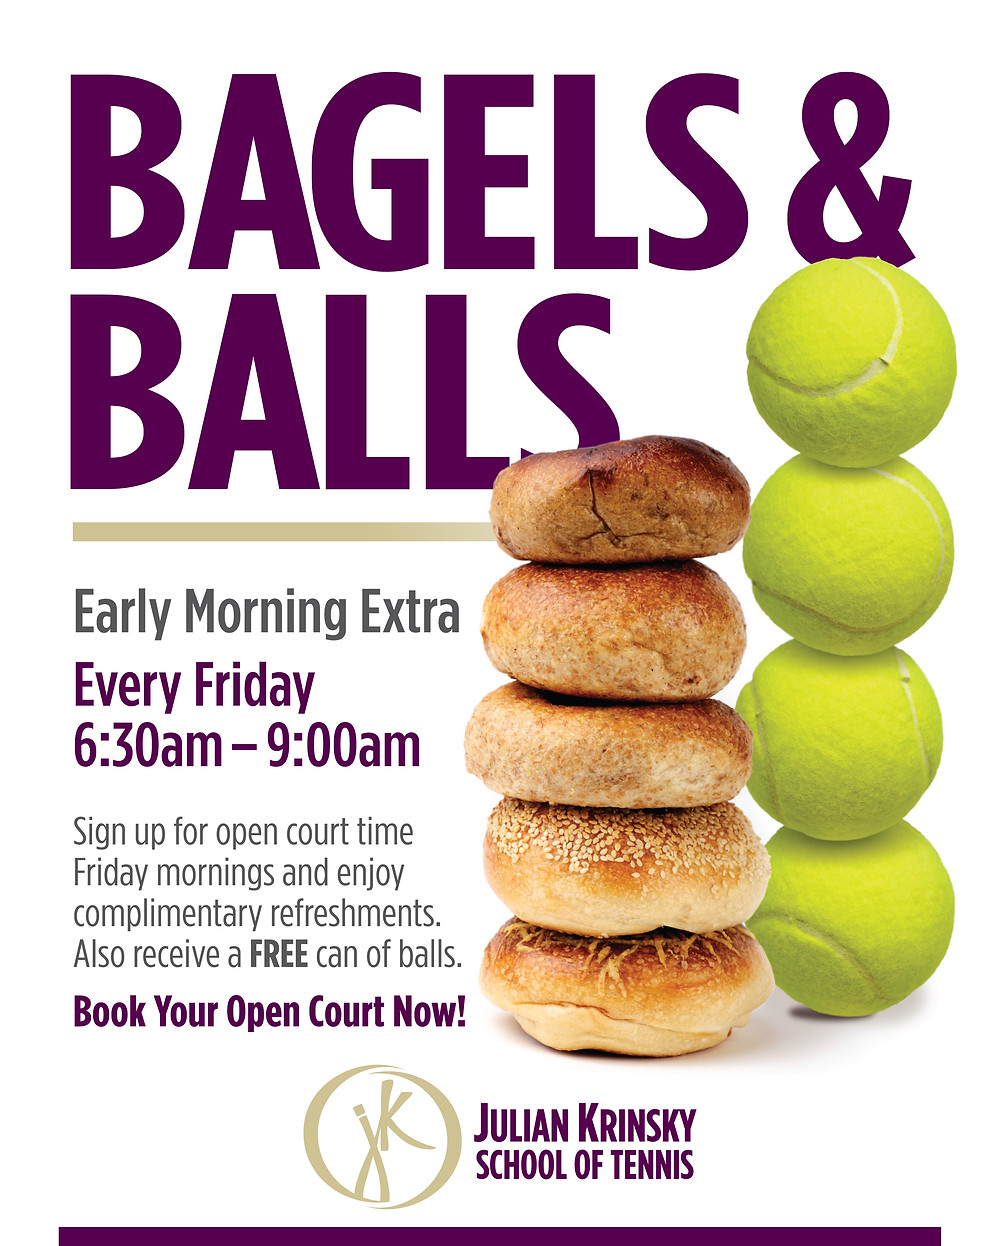 Bagels&Balls flyer.jpg